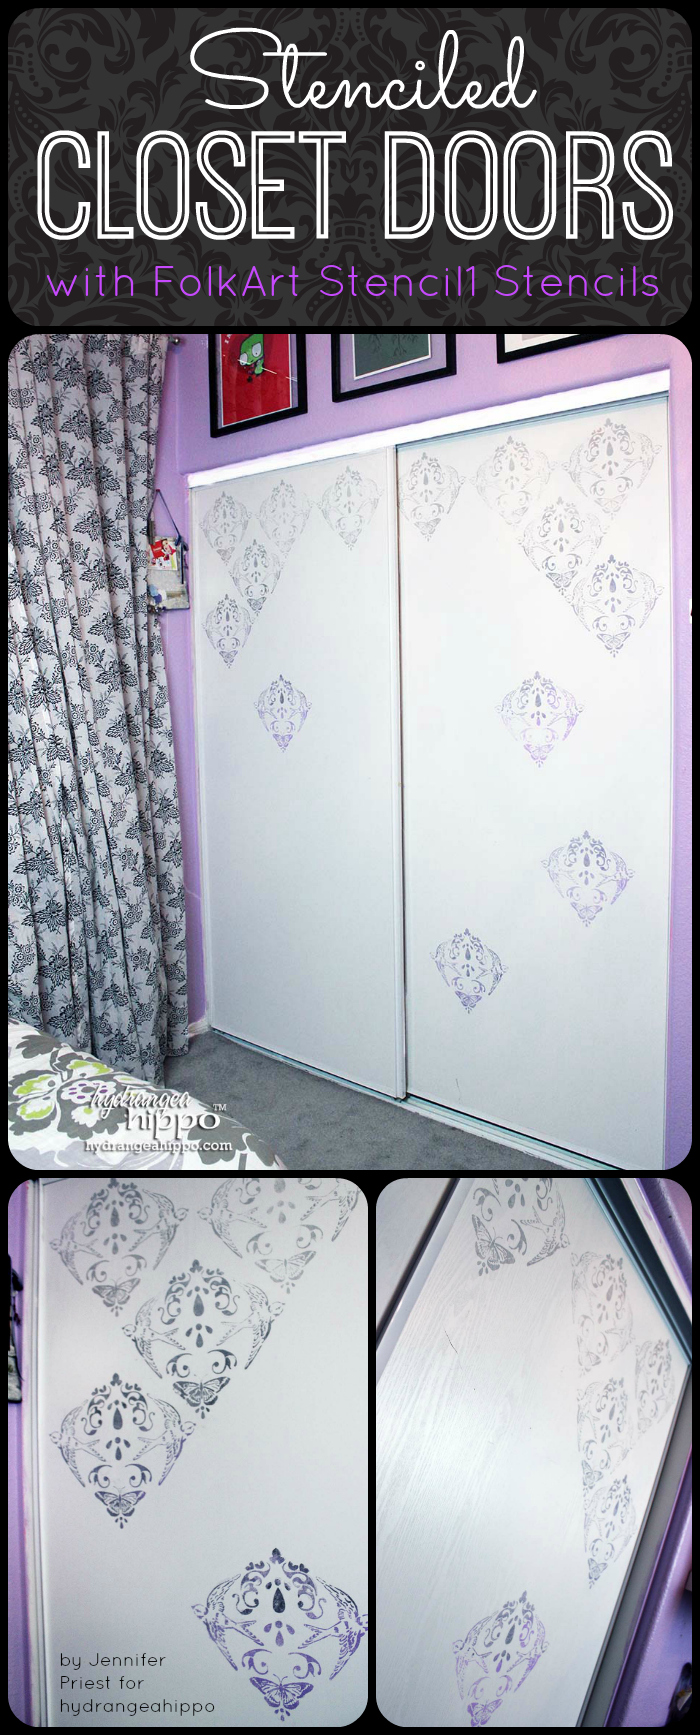 DIy Stenciled Closet Doors with FolkArt Stencil1 by Jennifer Priest